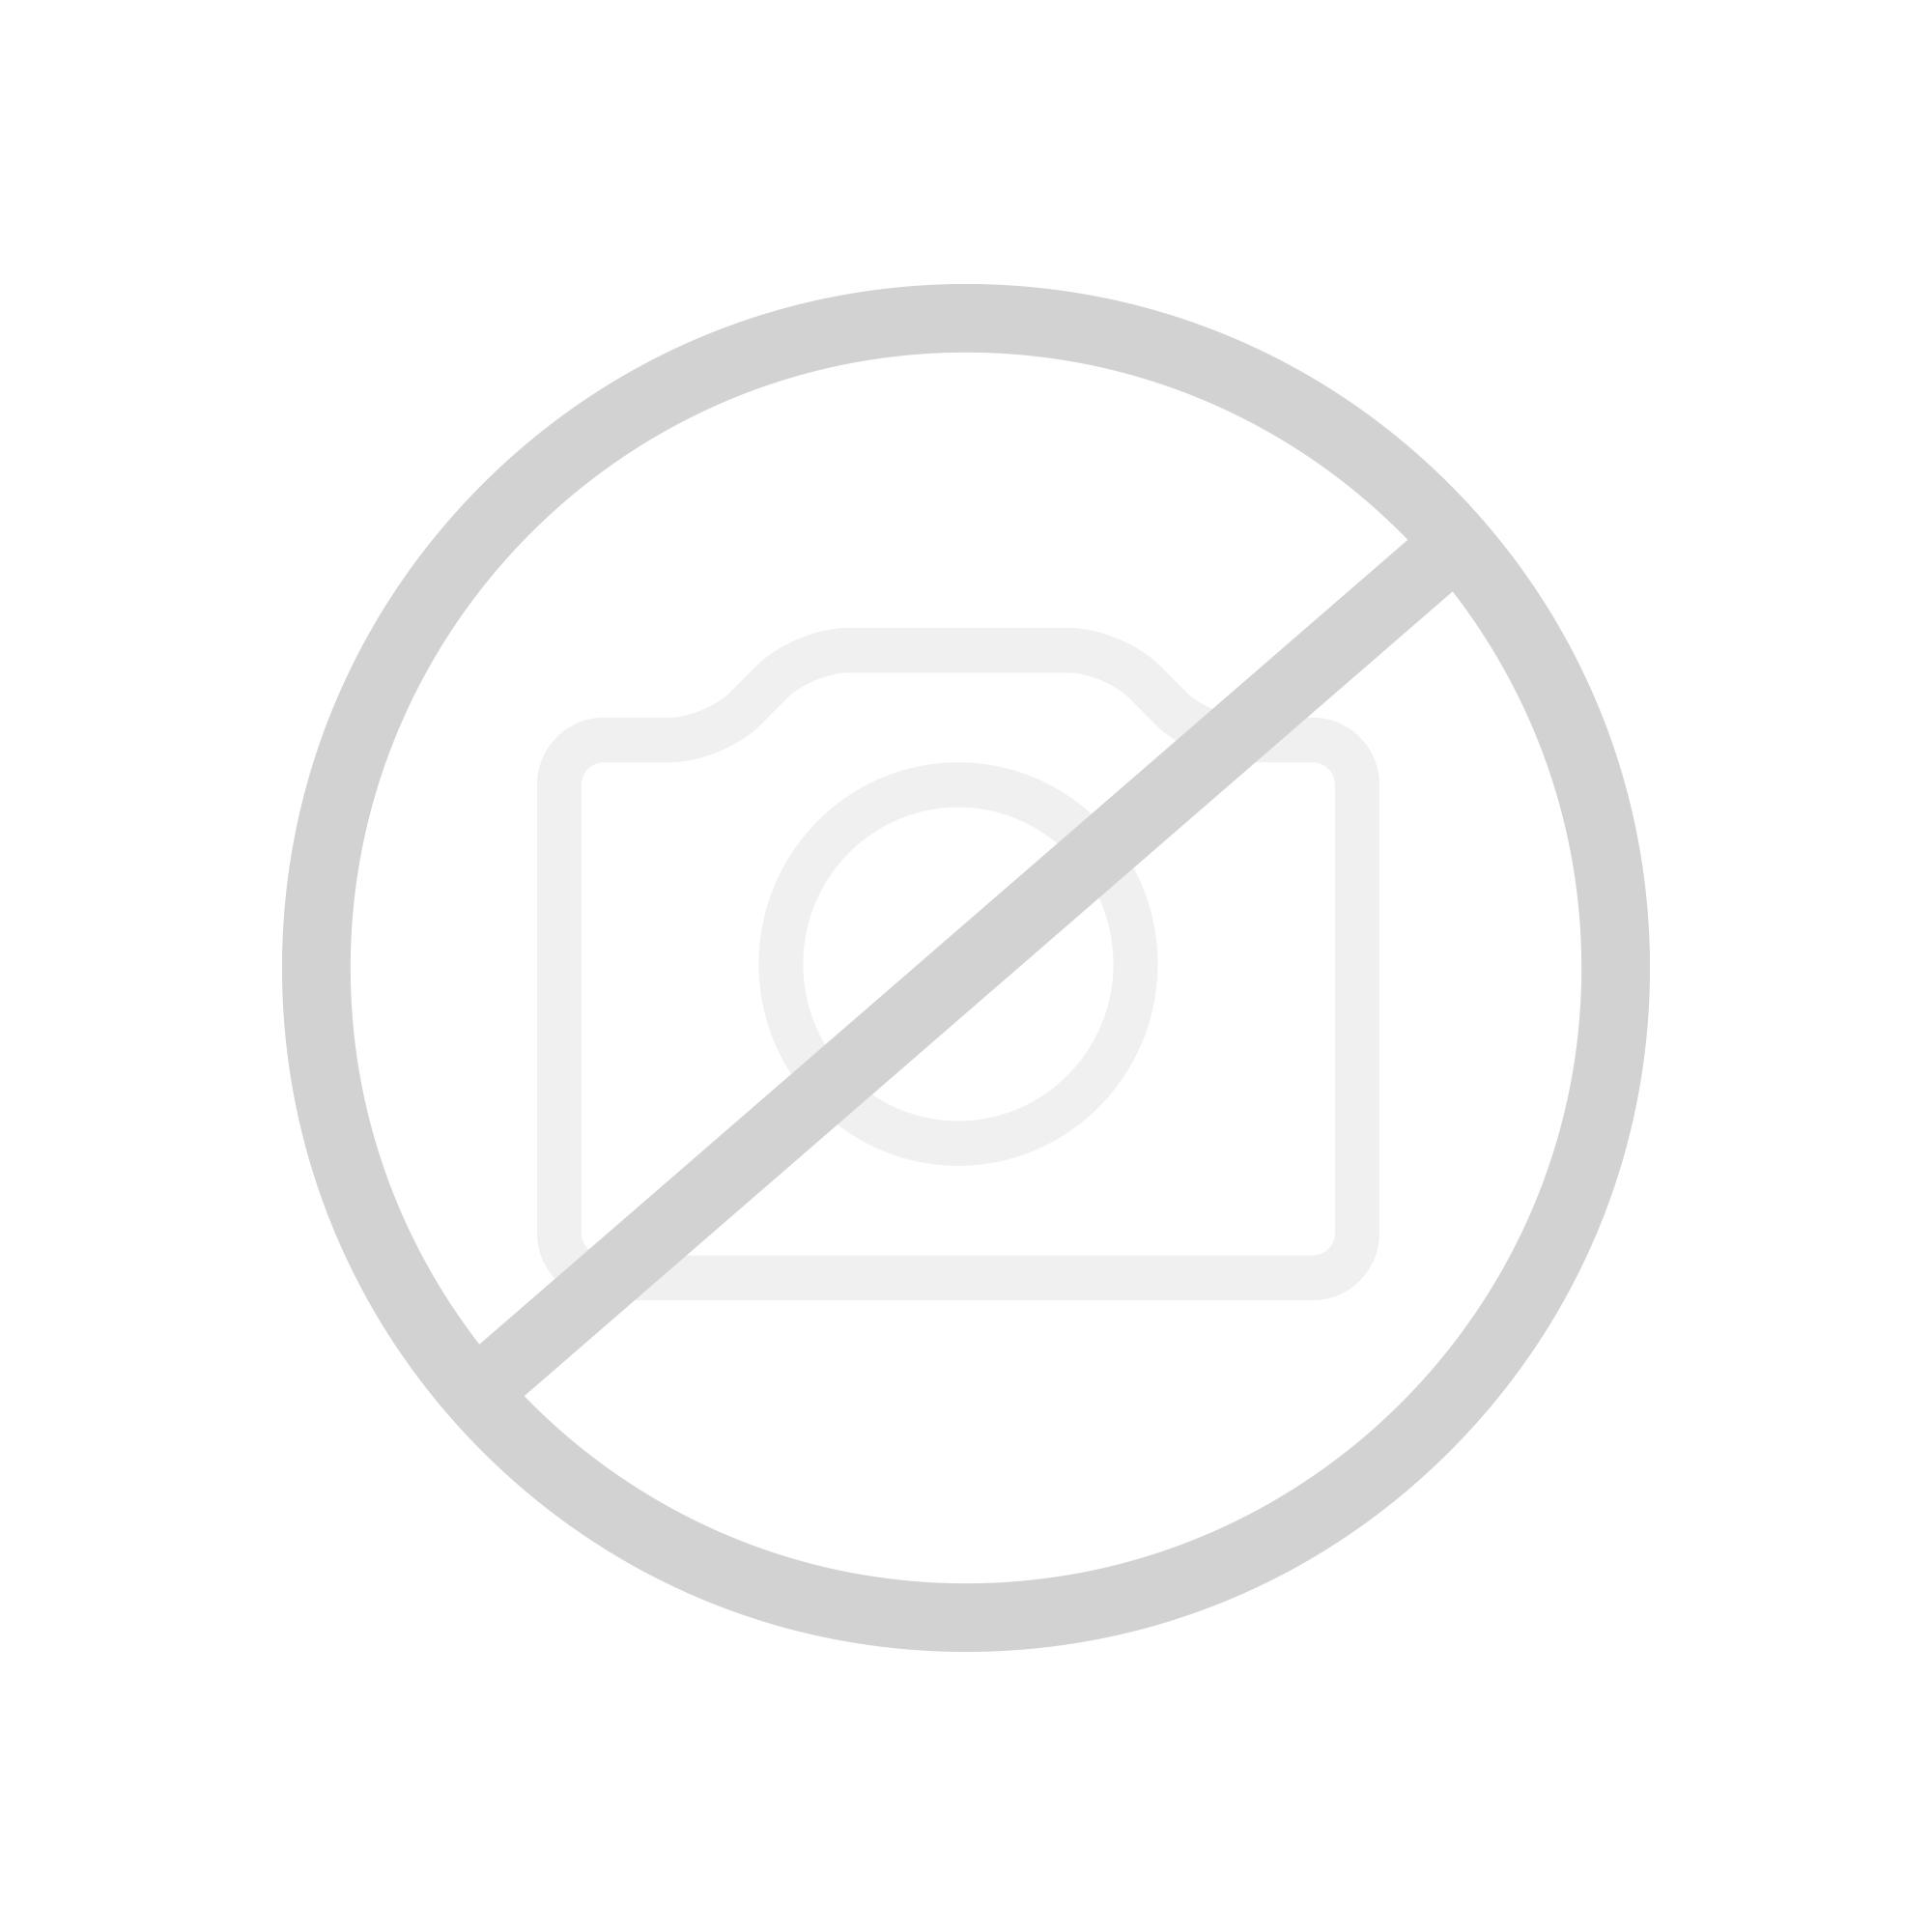 Hansgrohe Axor Citterio Einhebel Wannenmischer - 39455000 | REUTER | {Badarmaturen hansgrohe 30}